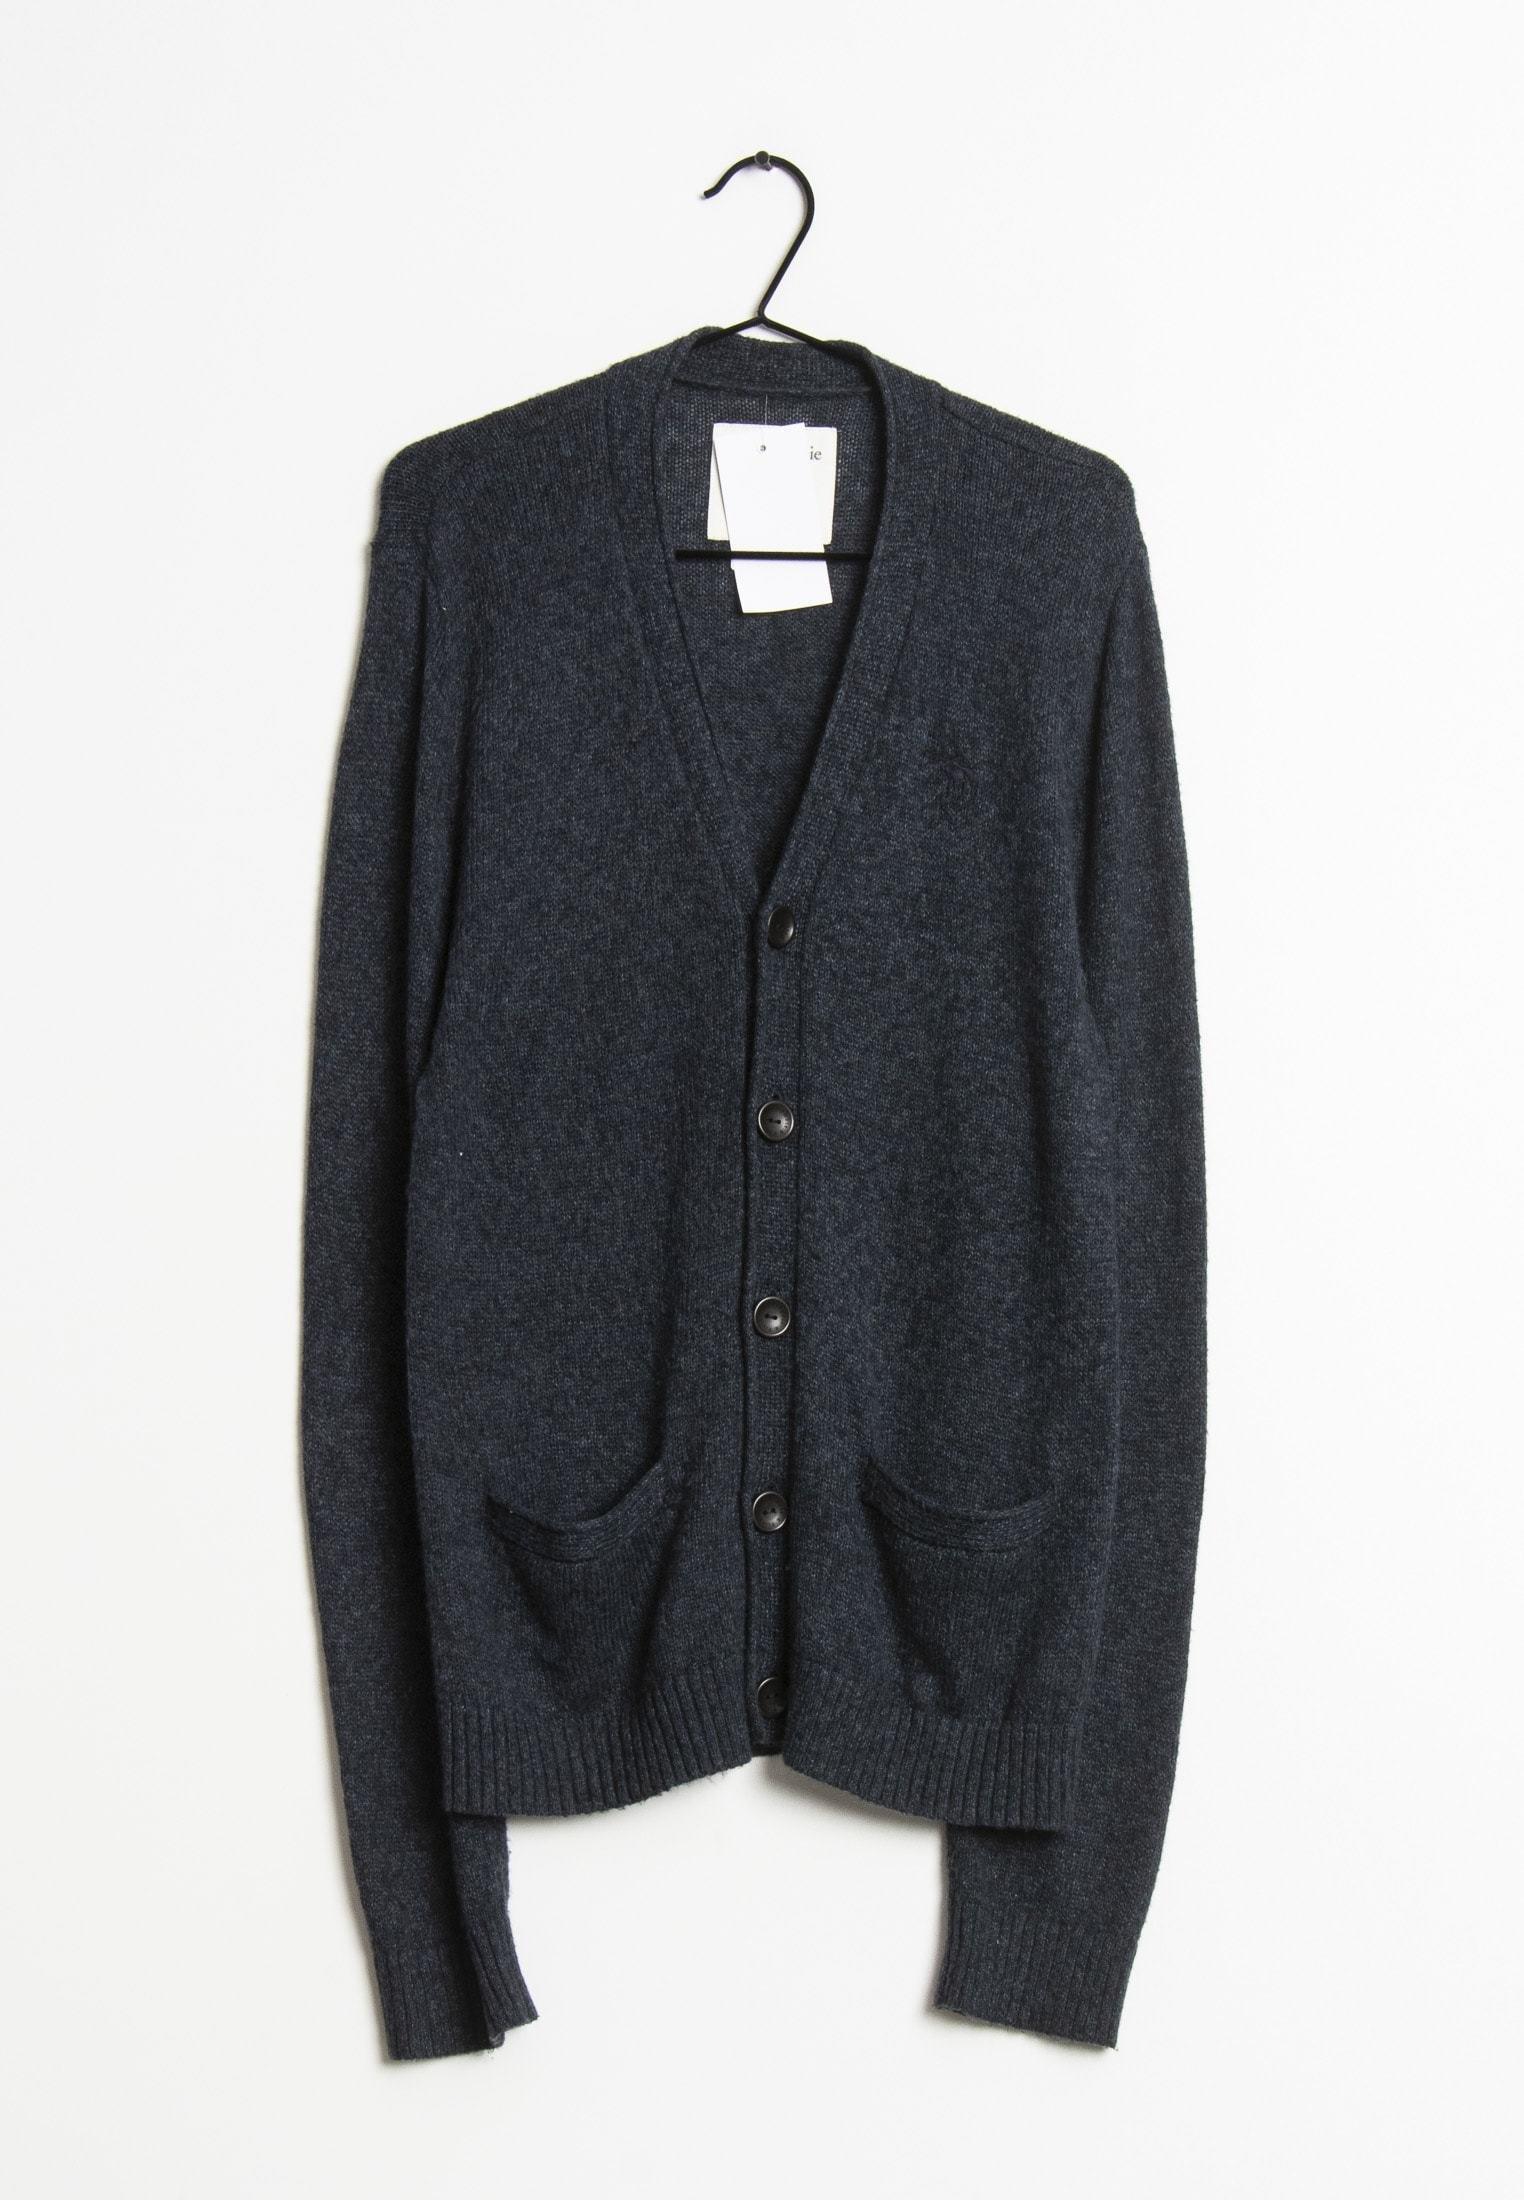 Abercrombie & Fitch Dames truien & vesten online | ZALANDO